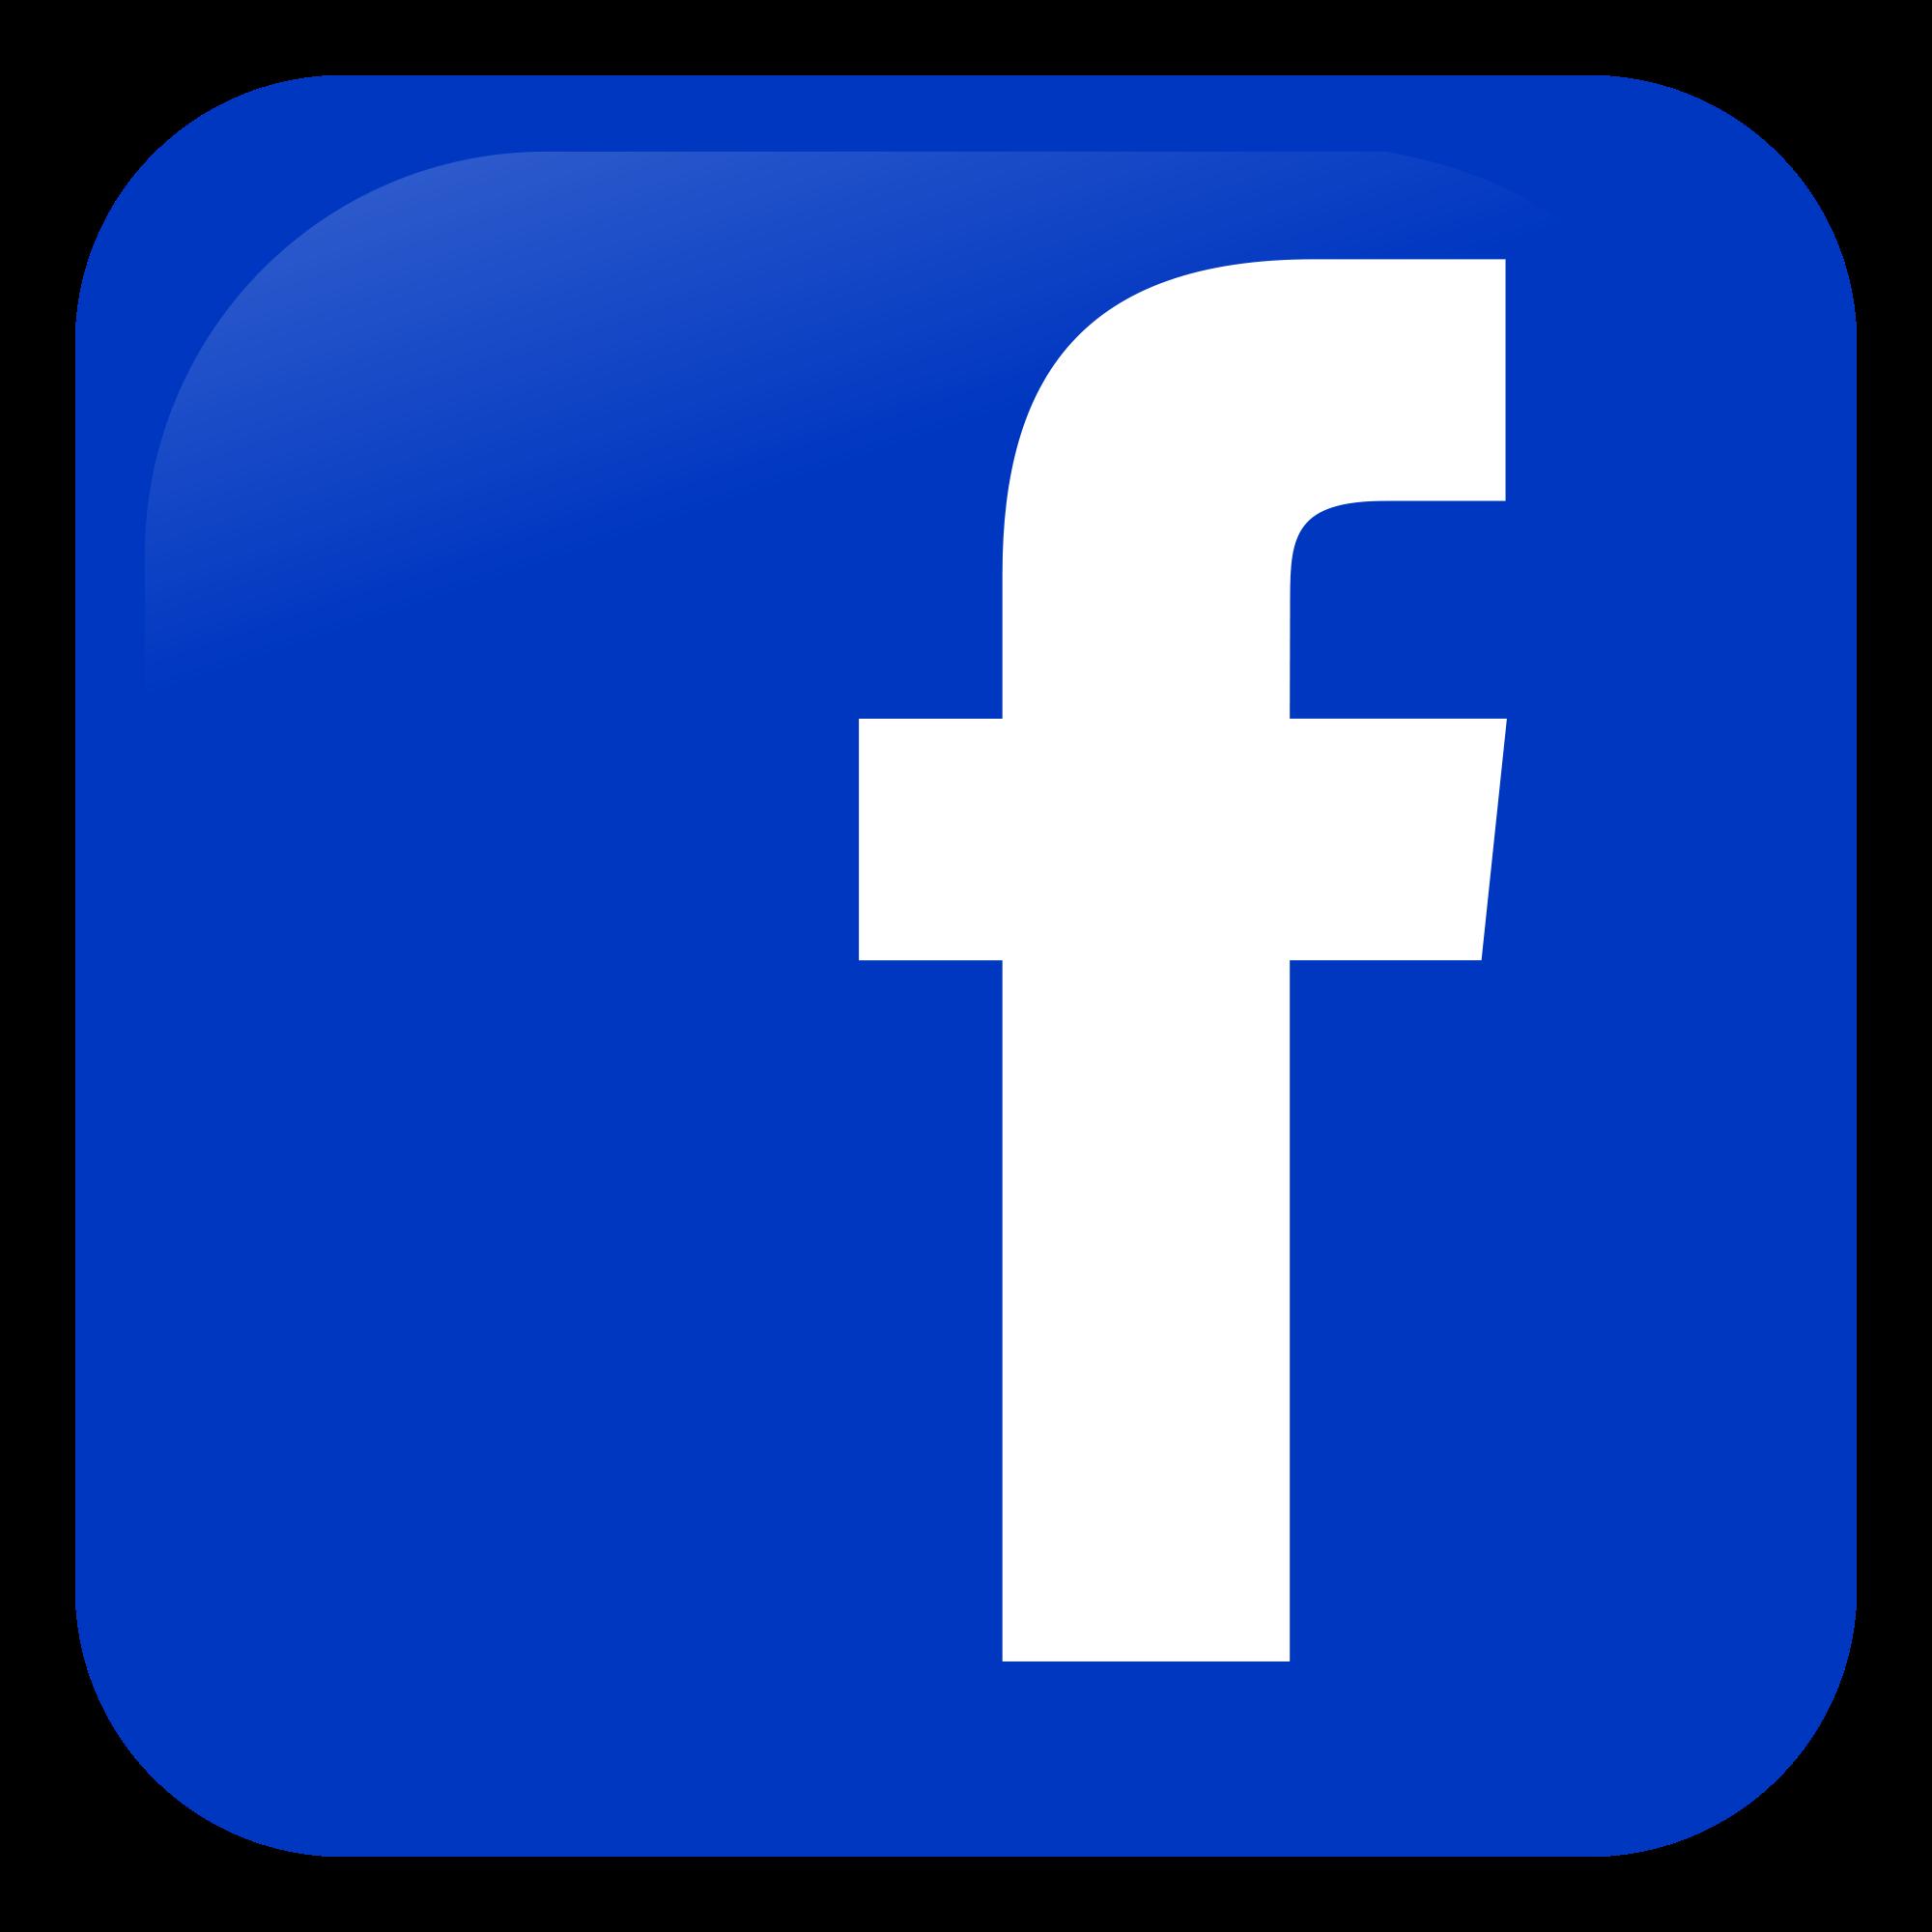 Facebook Logo image #4